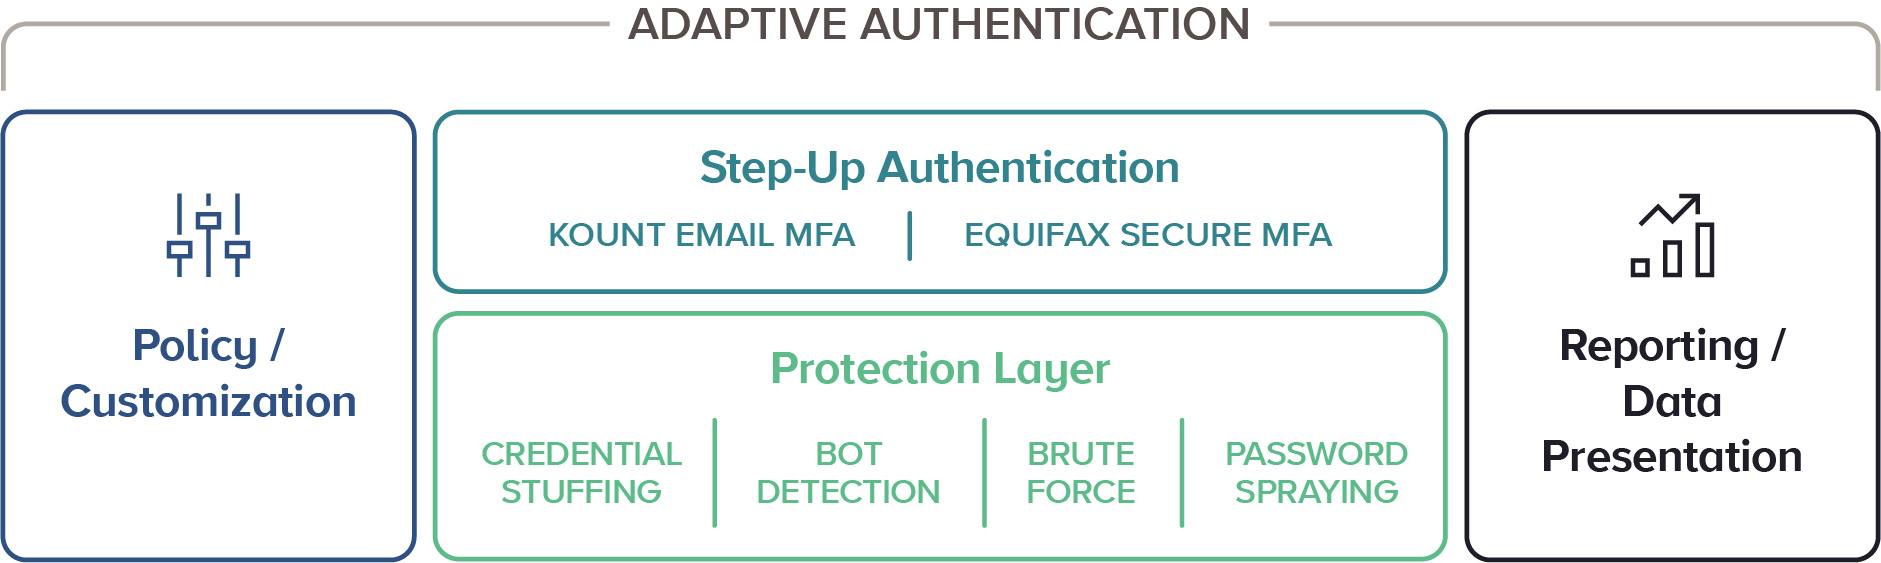 Account Takeover ATO Prevention Adaptive Authentication